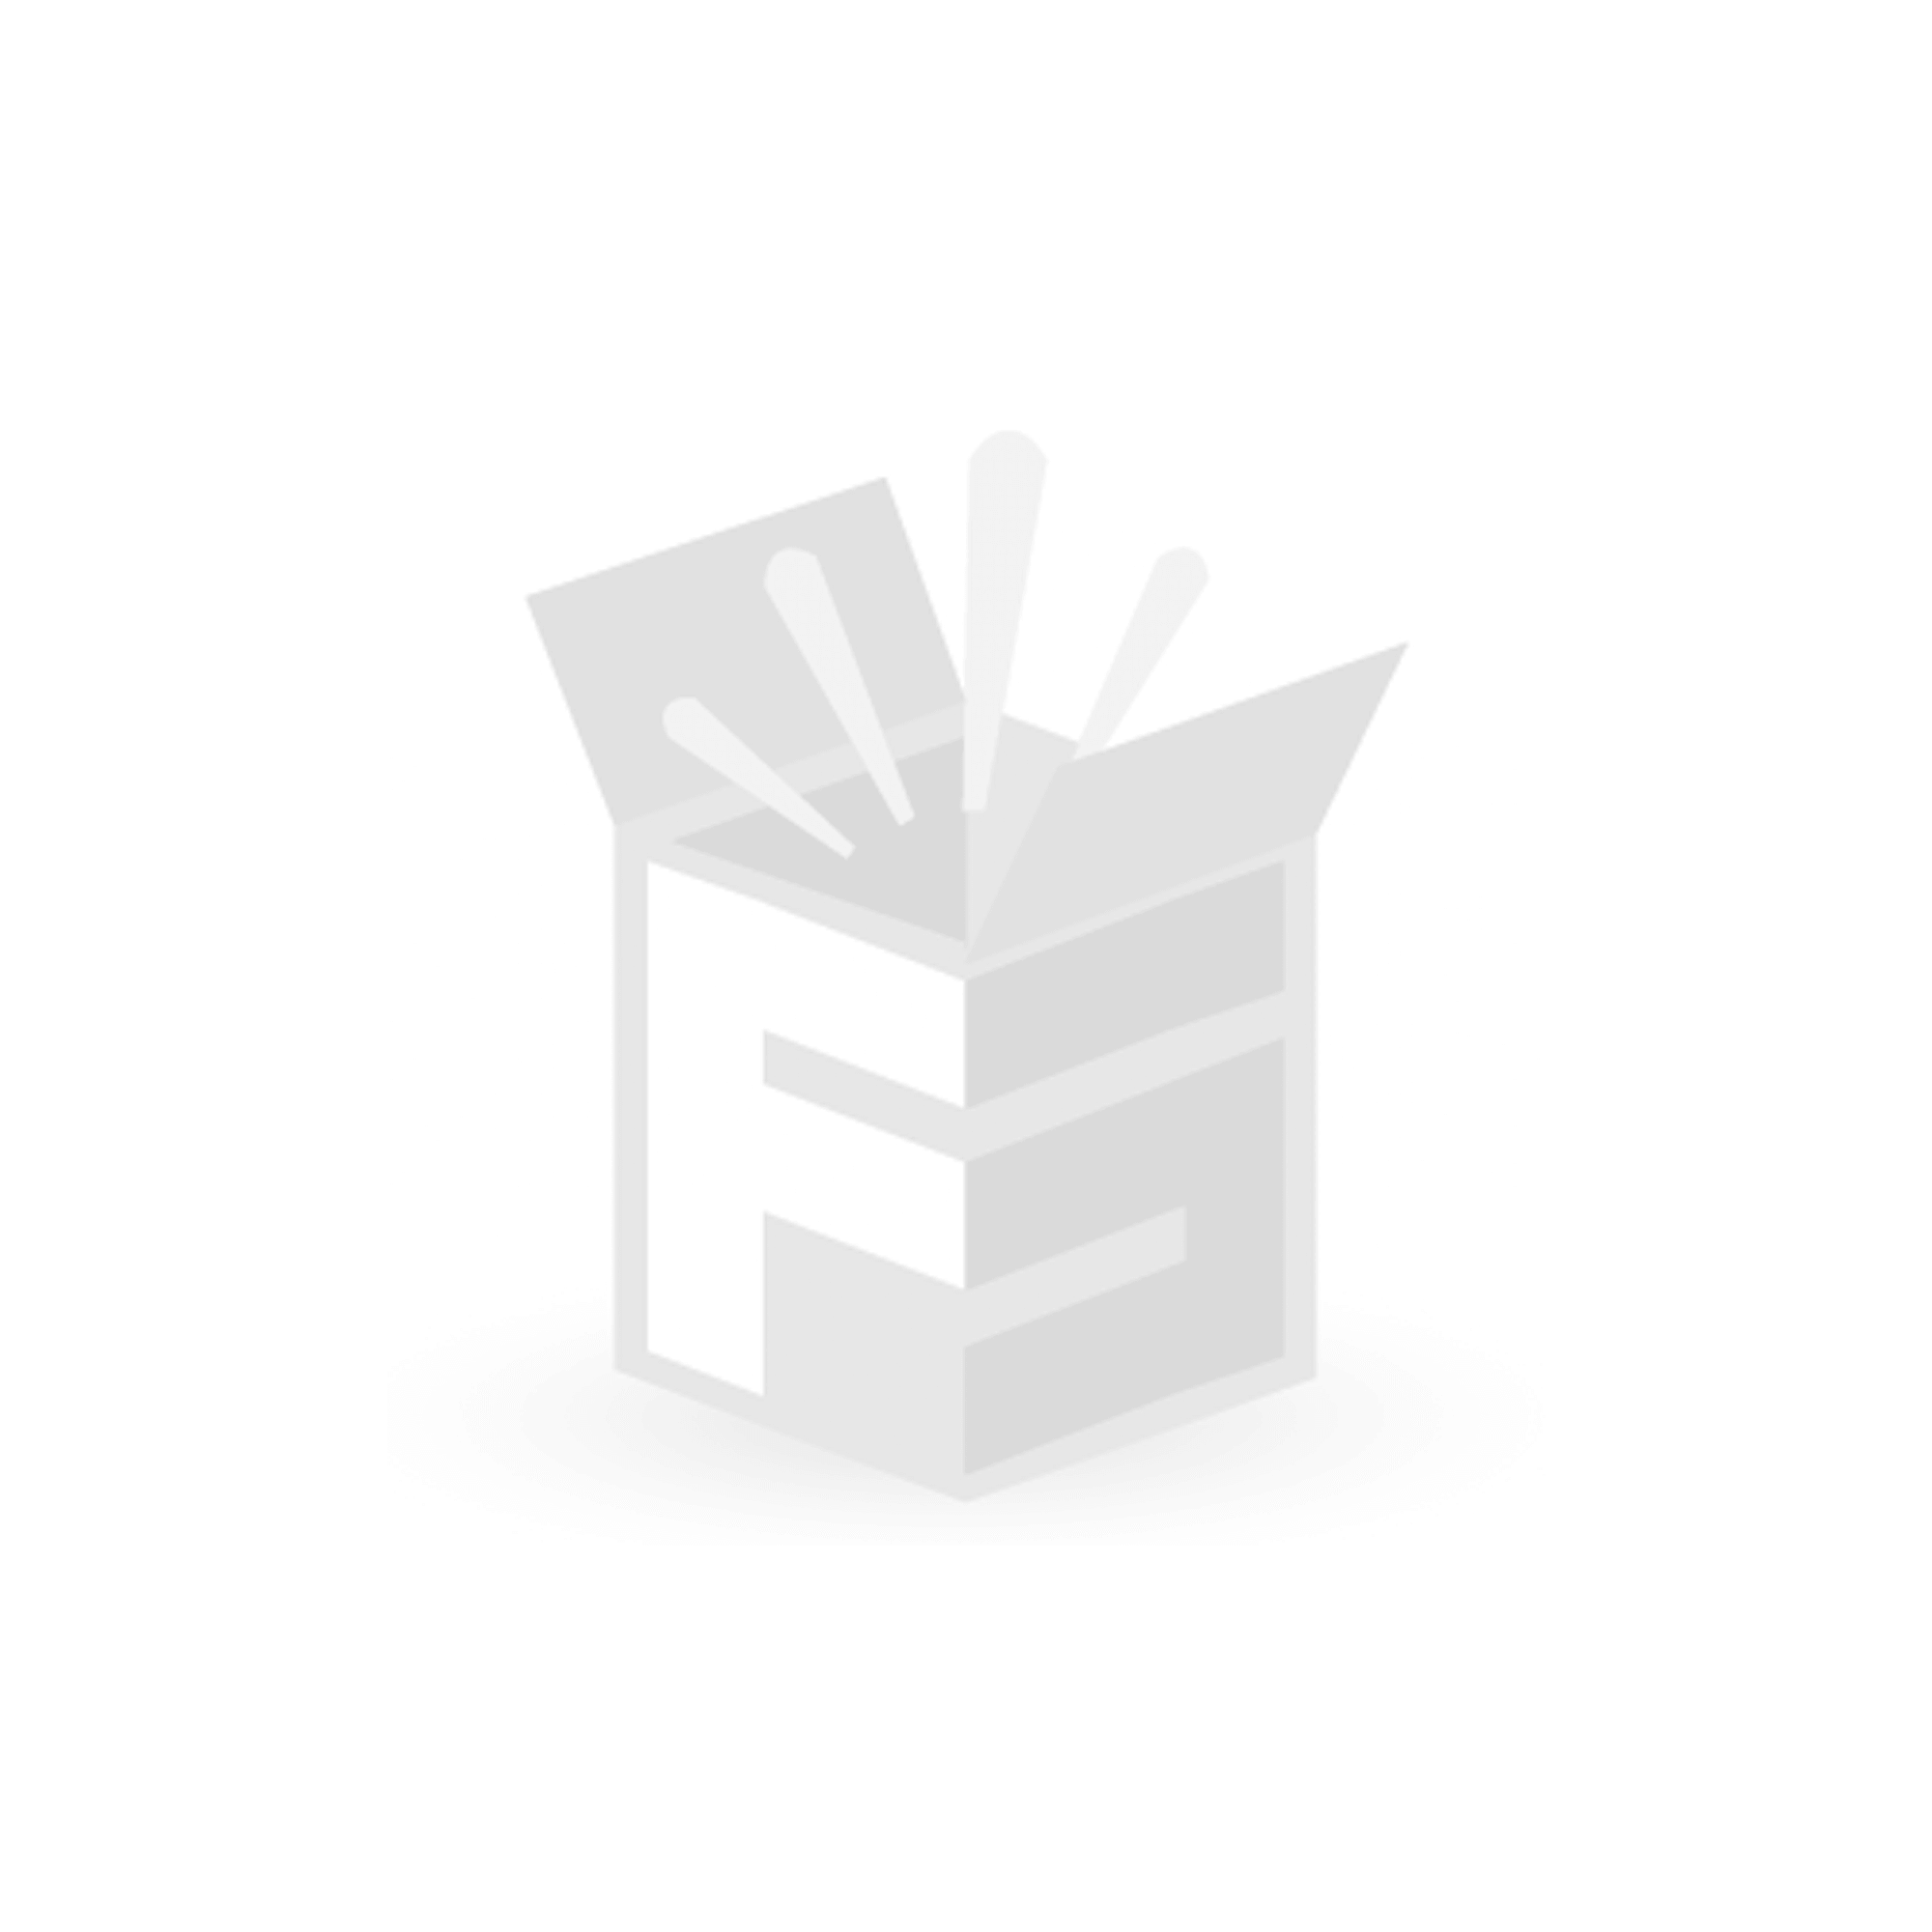 FS-STAR Muffin-Backblech mit 12 Silkonförmchen